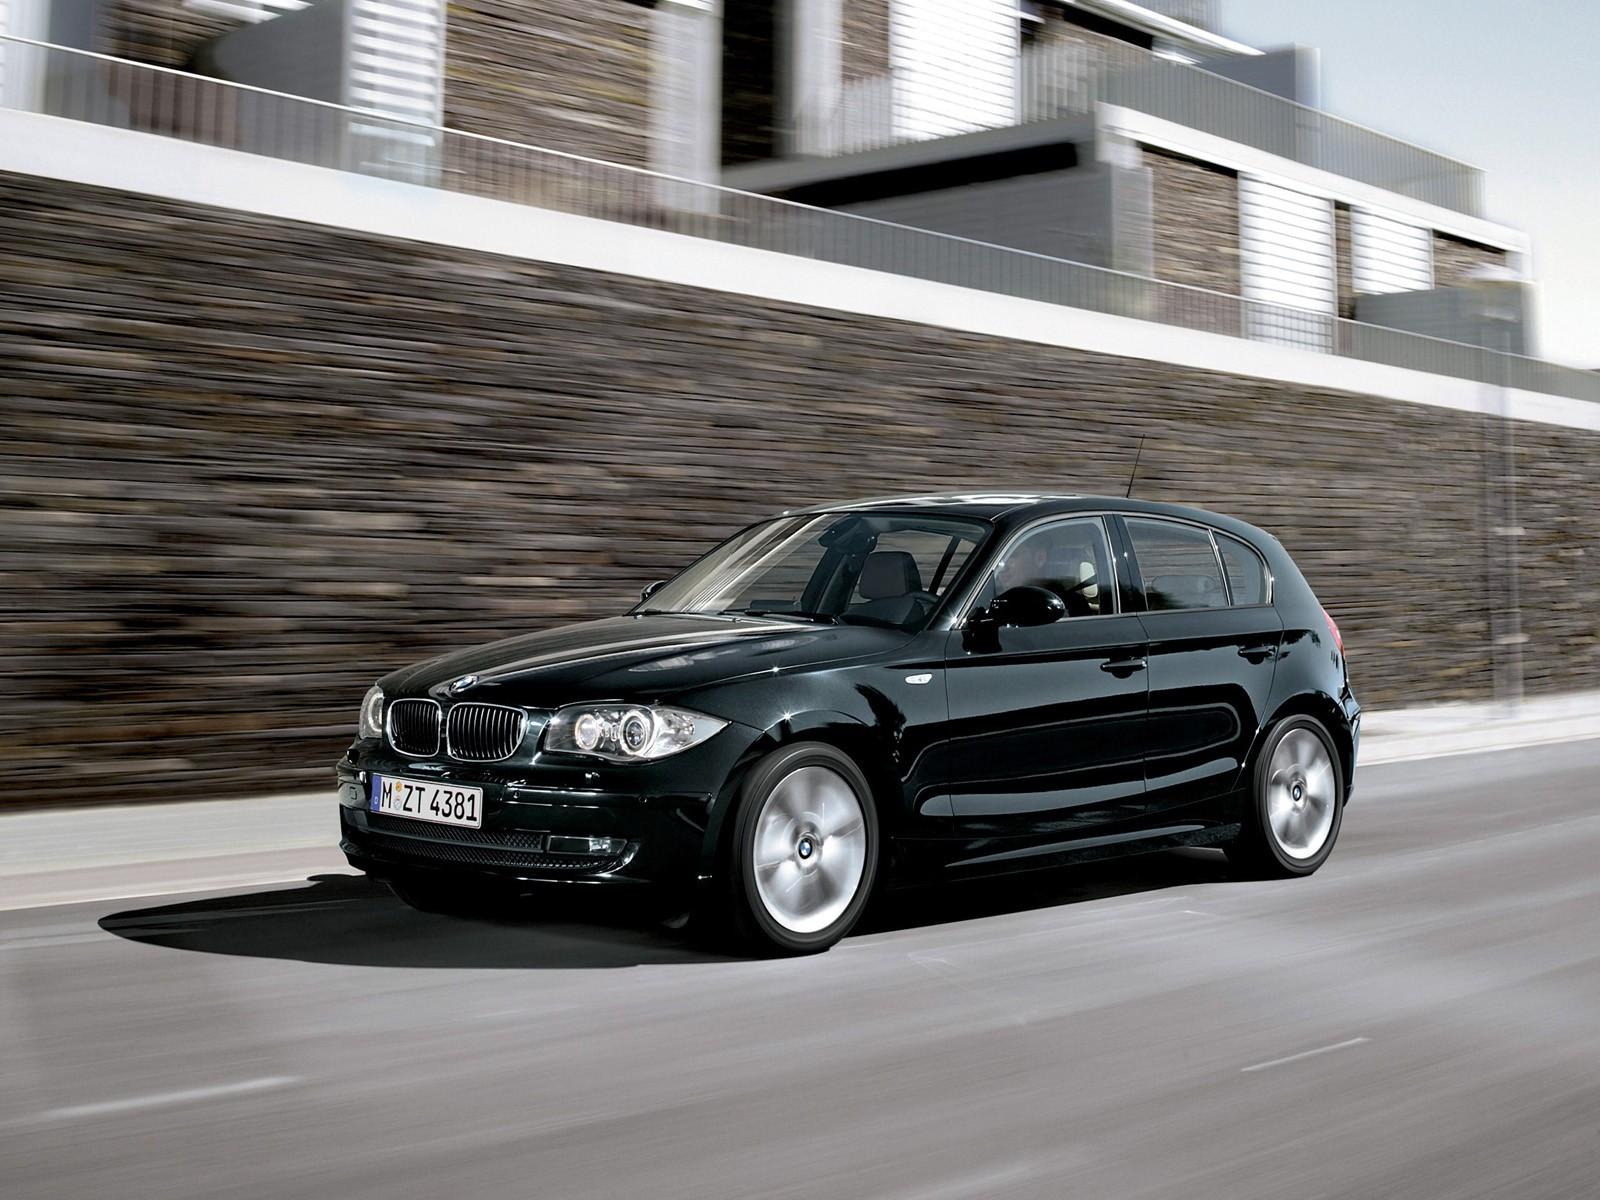 BMW 1 Series (E87) specs - 2007, 2008, 2009, 2010, 2011 - autoevolution